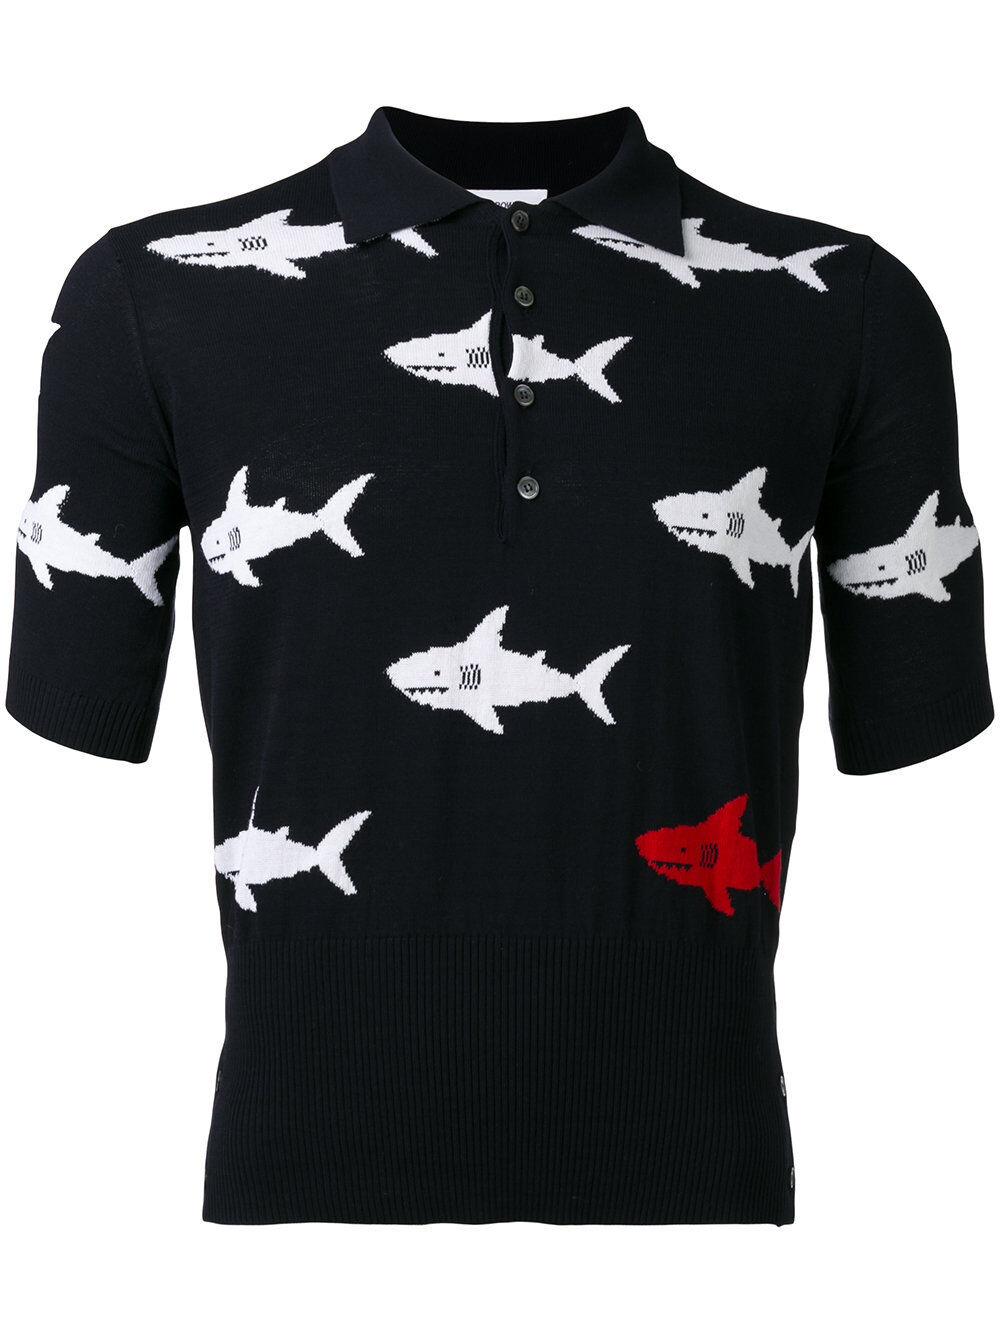 a6482a3e0f0f Thom Browne Shark Intarsia Short Sleeve Knit Polo. 2. for sale ...